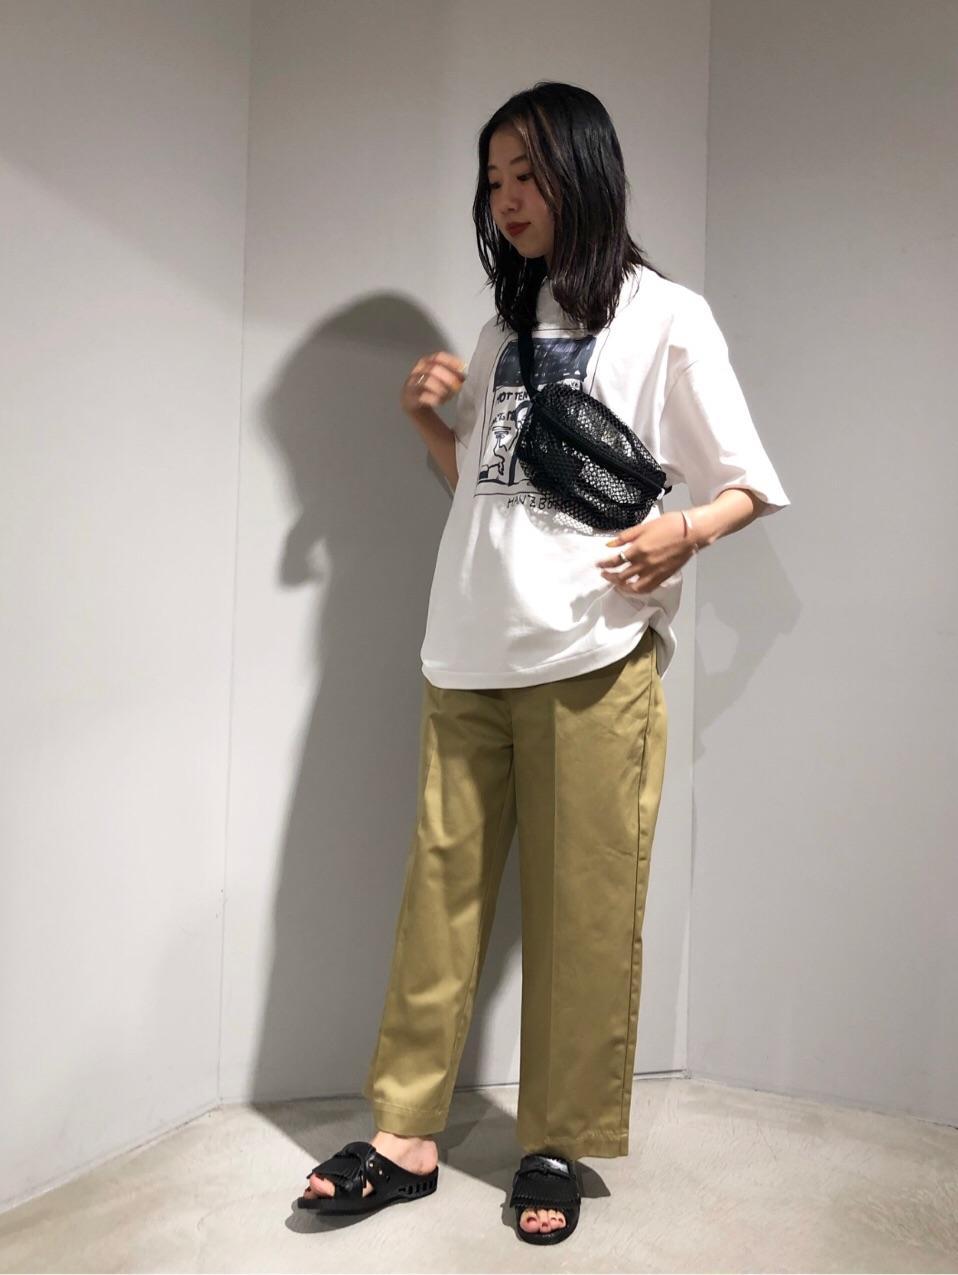 caph troupe 代々木上原路面 身長:166cm 2019.06.16